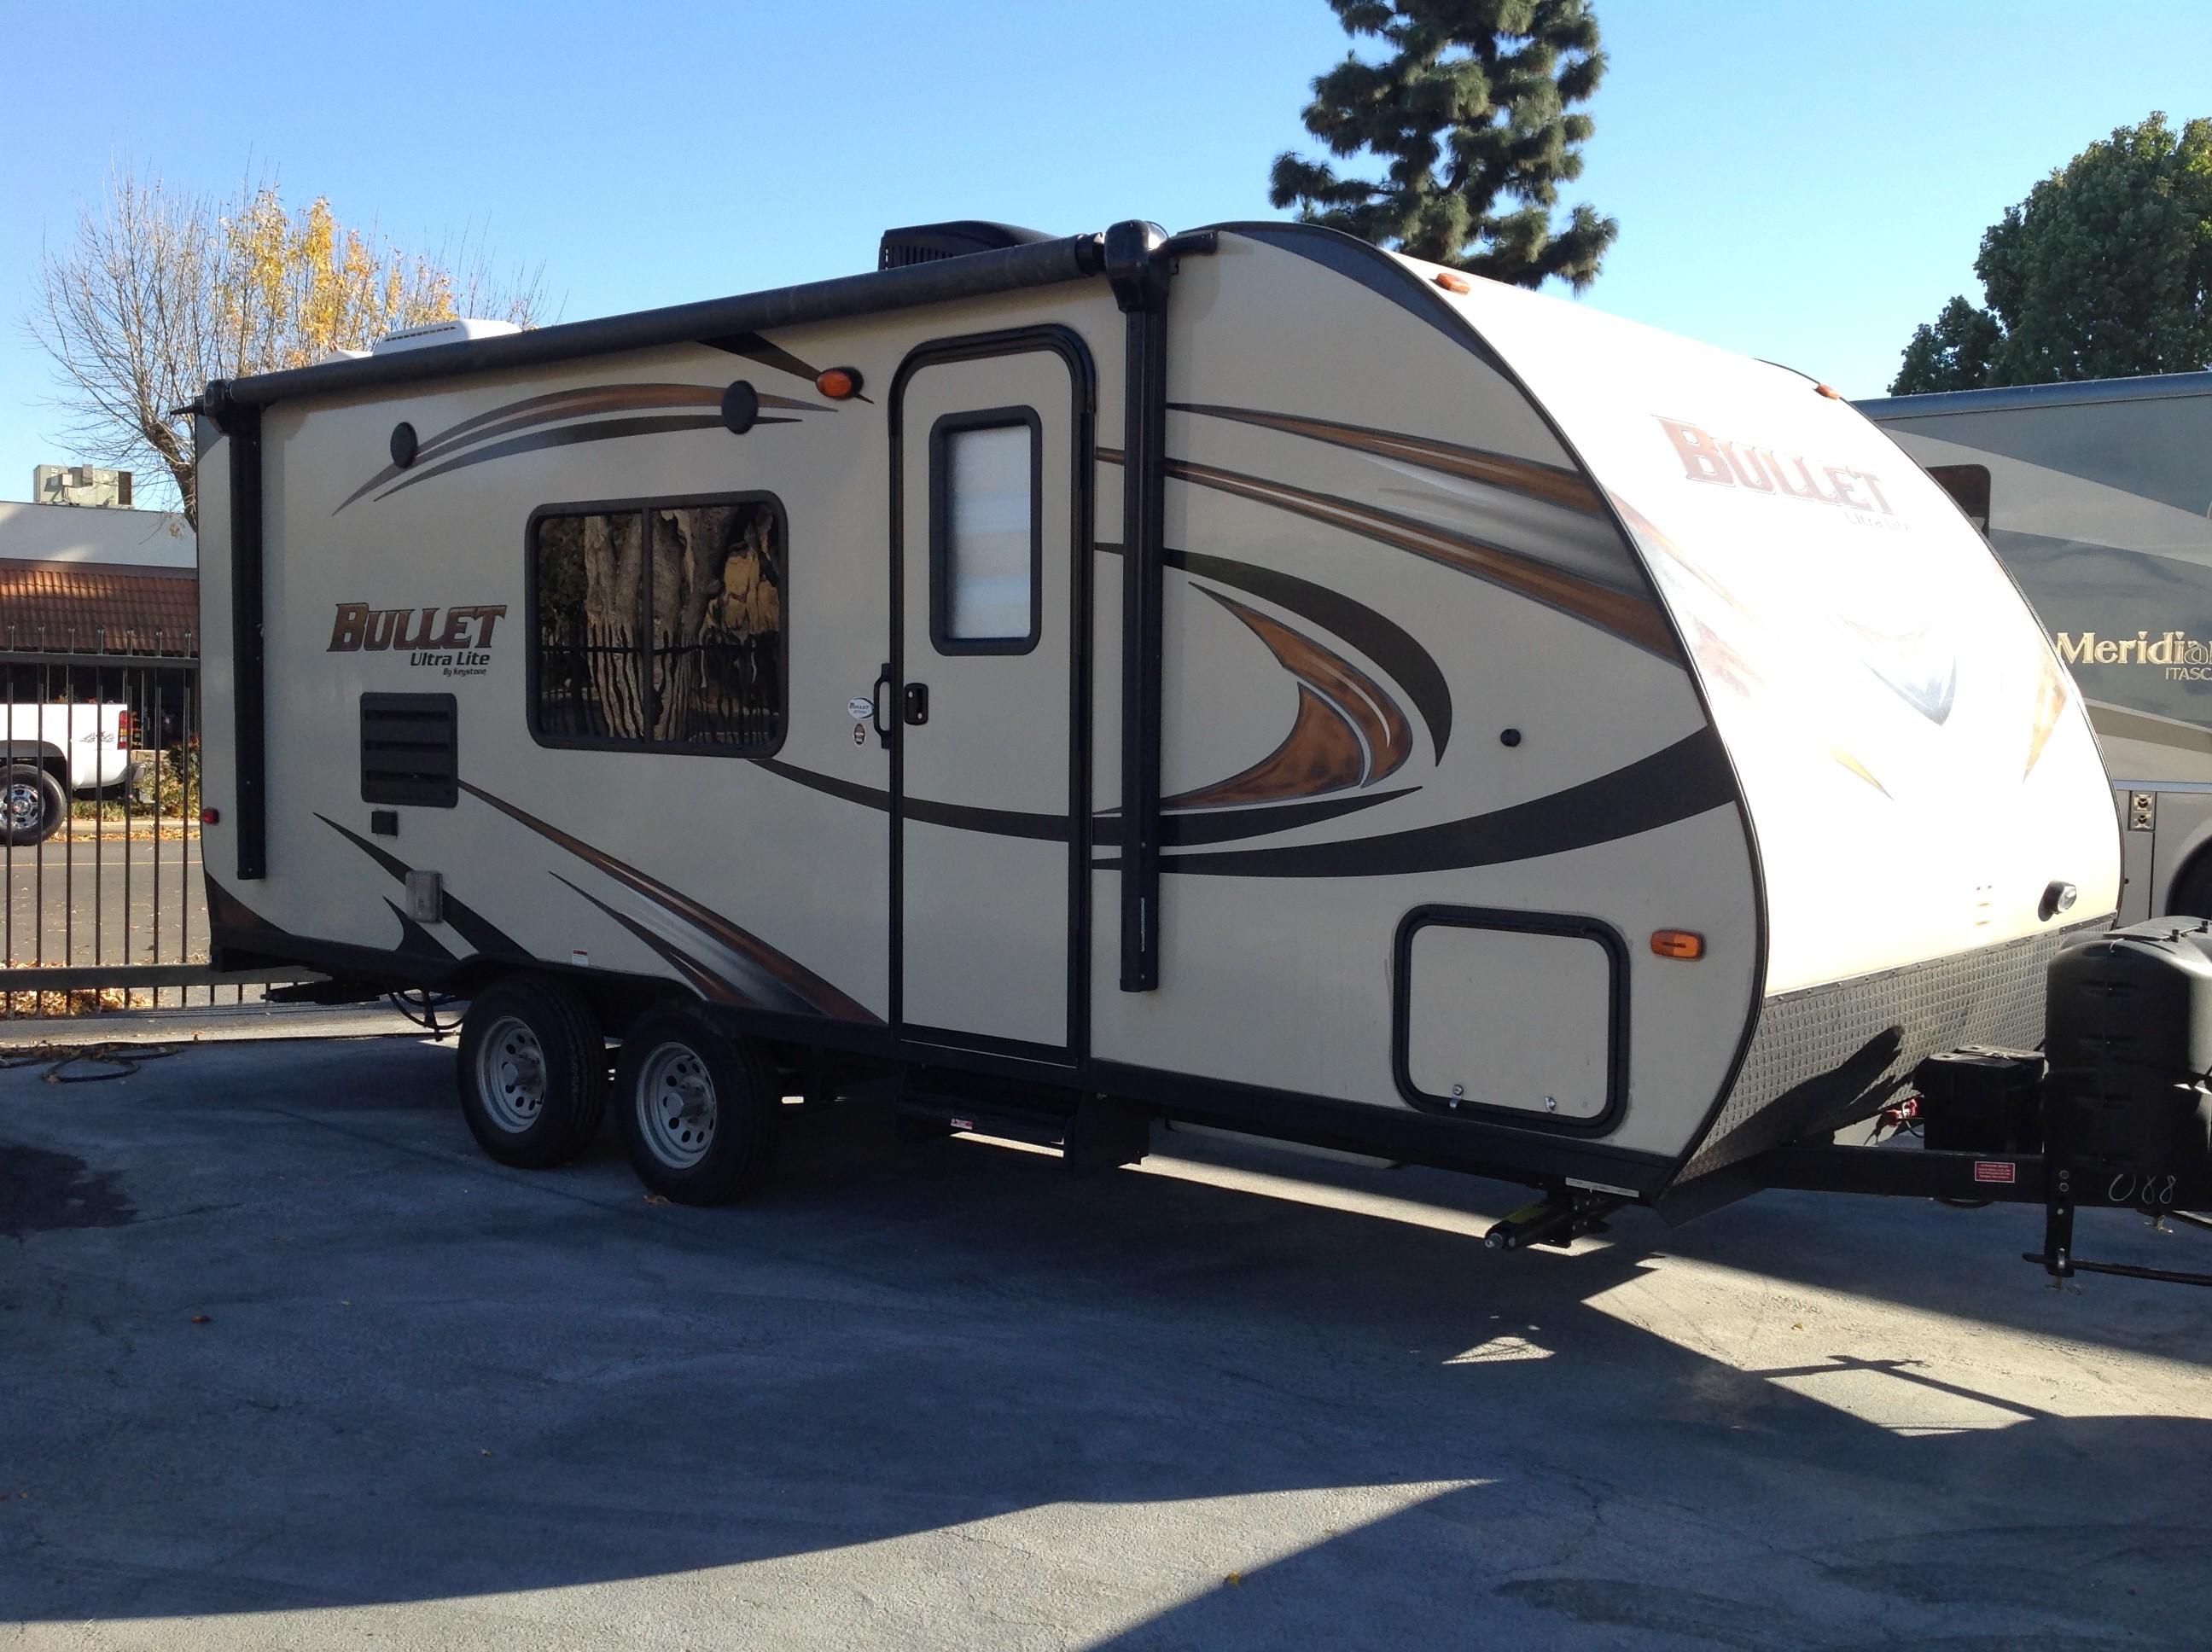 24ft Keystone Bullet Crossfire California Motor Home Rentals